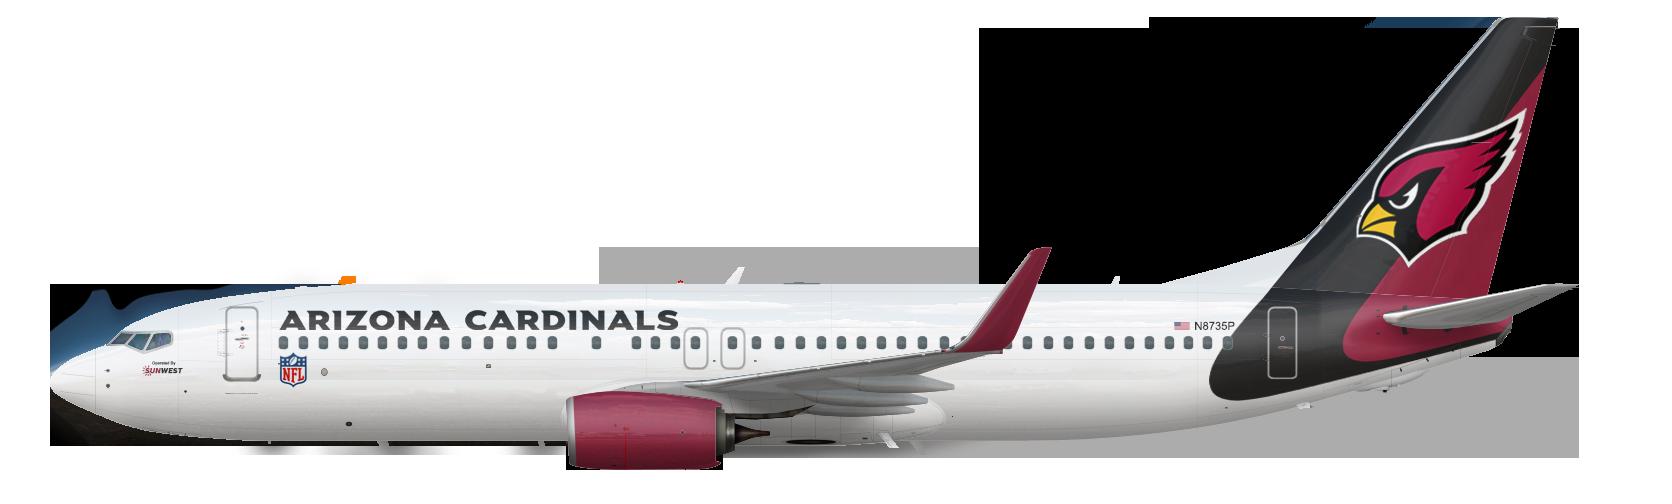 Boeing 737-800 Airzona Cardinals